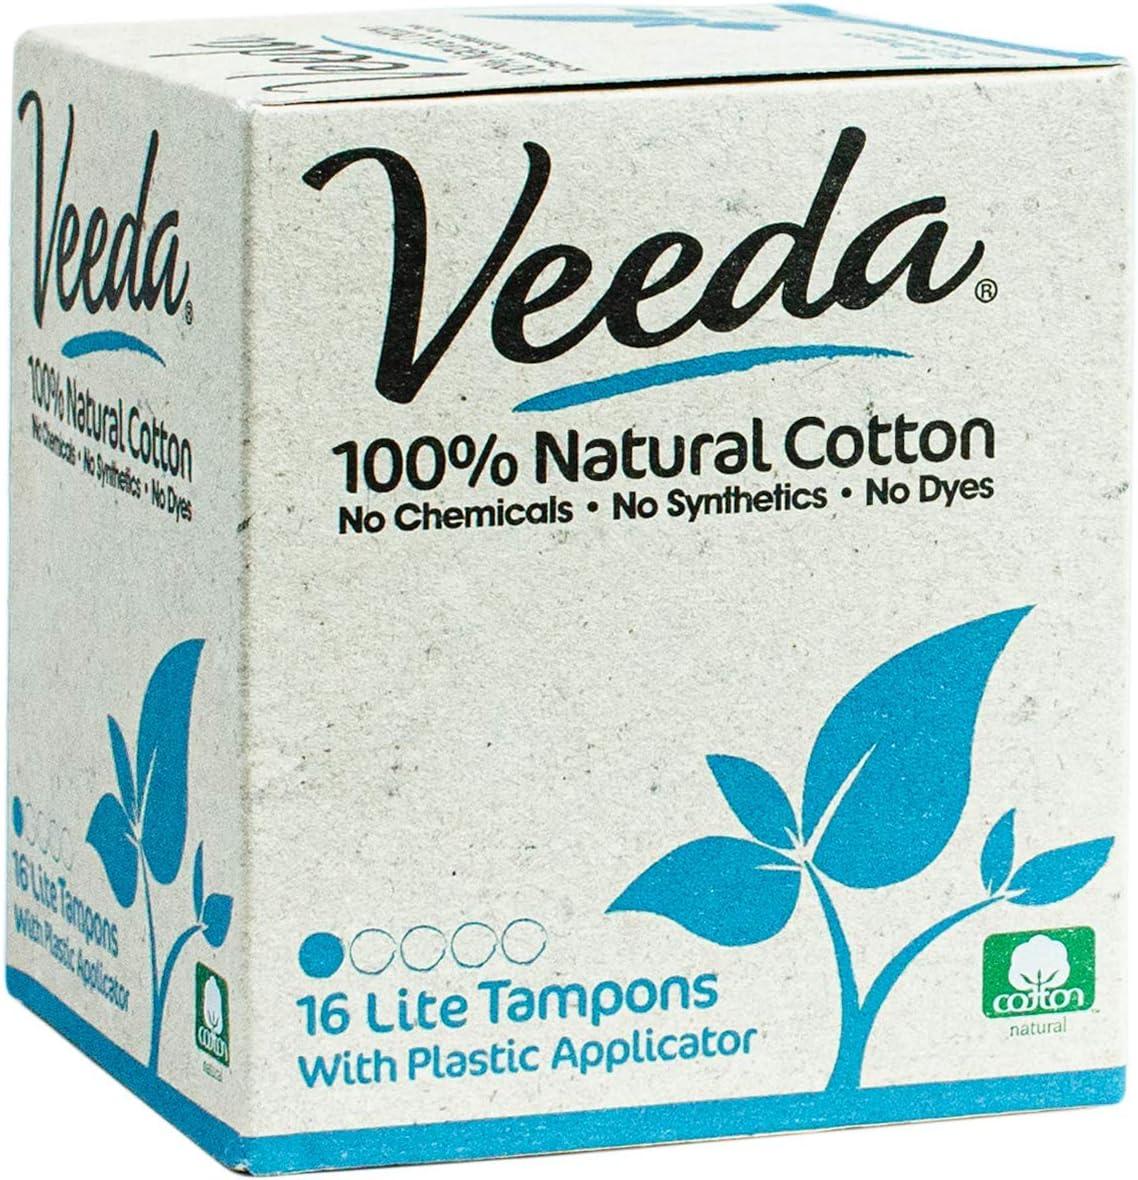 Seasonal discount Wrap Introduction Veeda 100% Natural Cotton Compact Applicator BPA-Free Ch Tampons